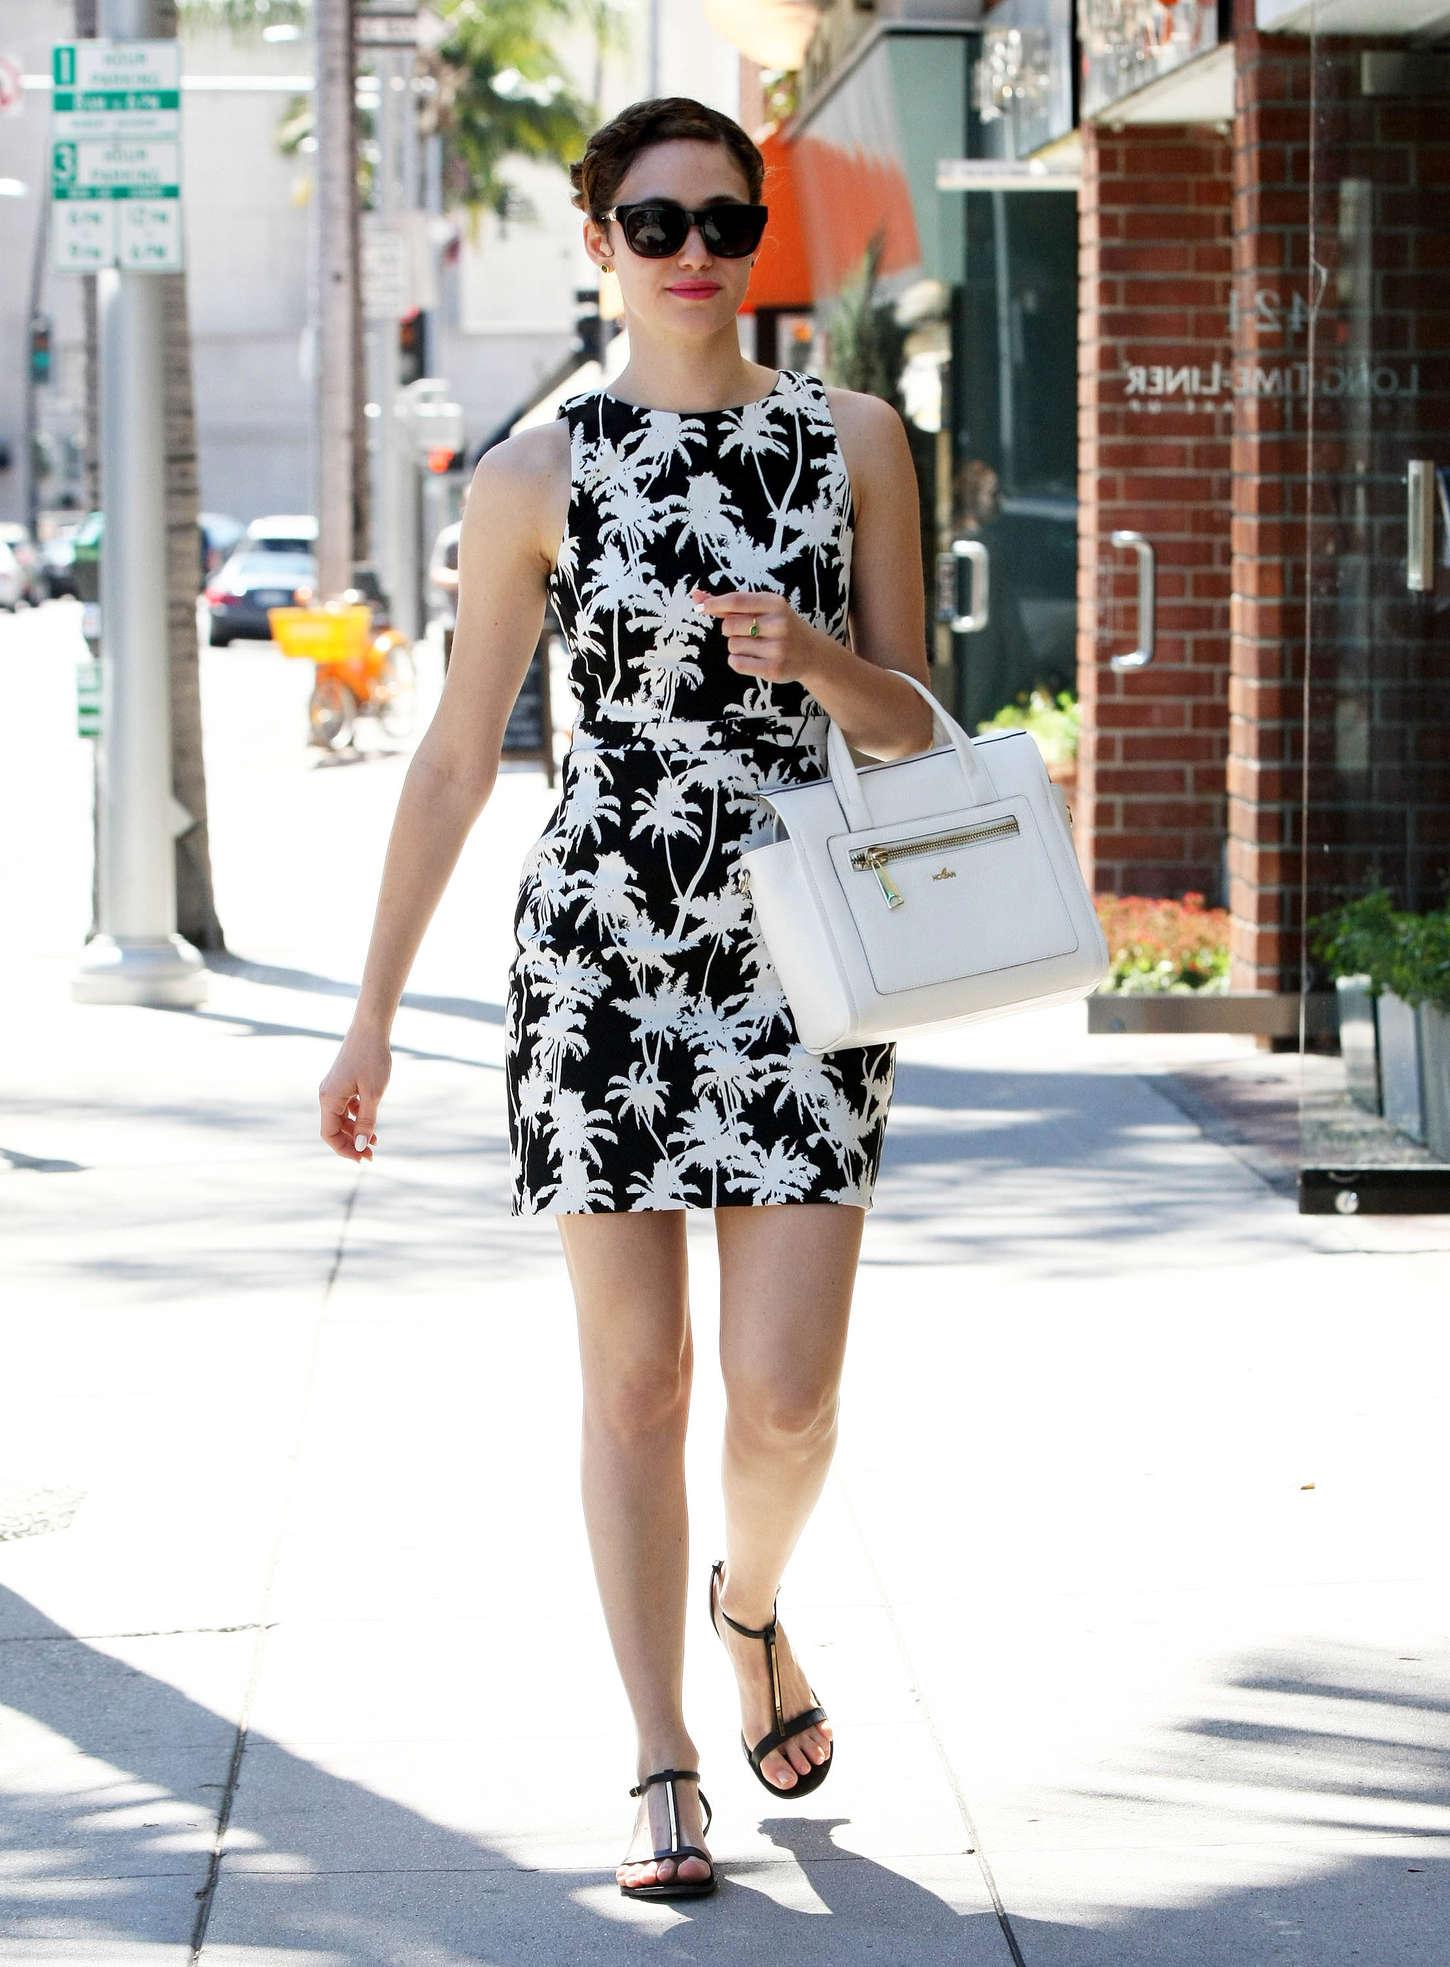 emmy rossum in short dress 17 gotceleb